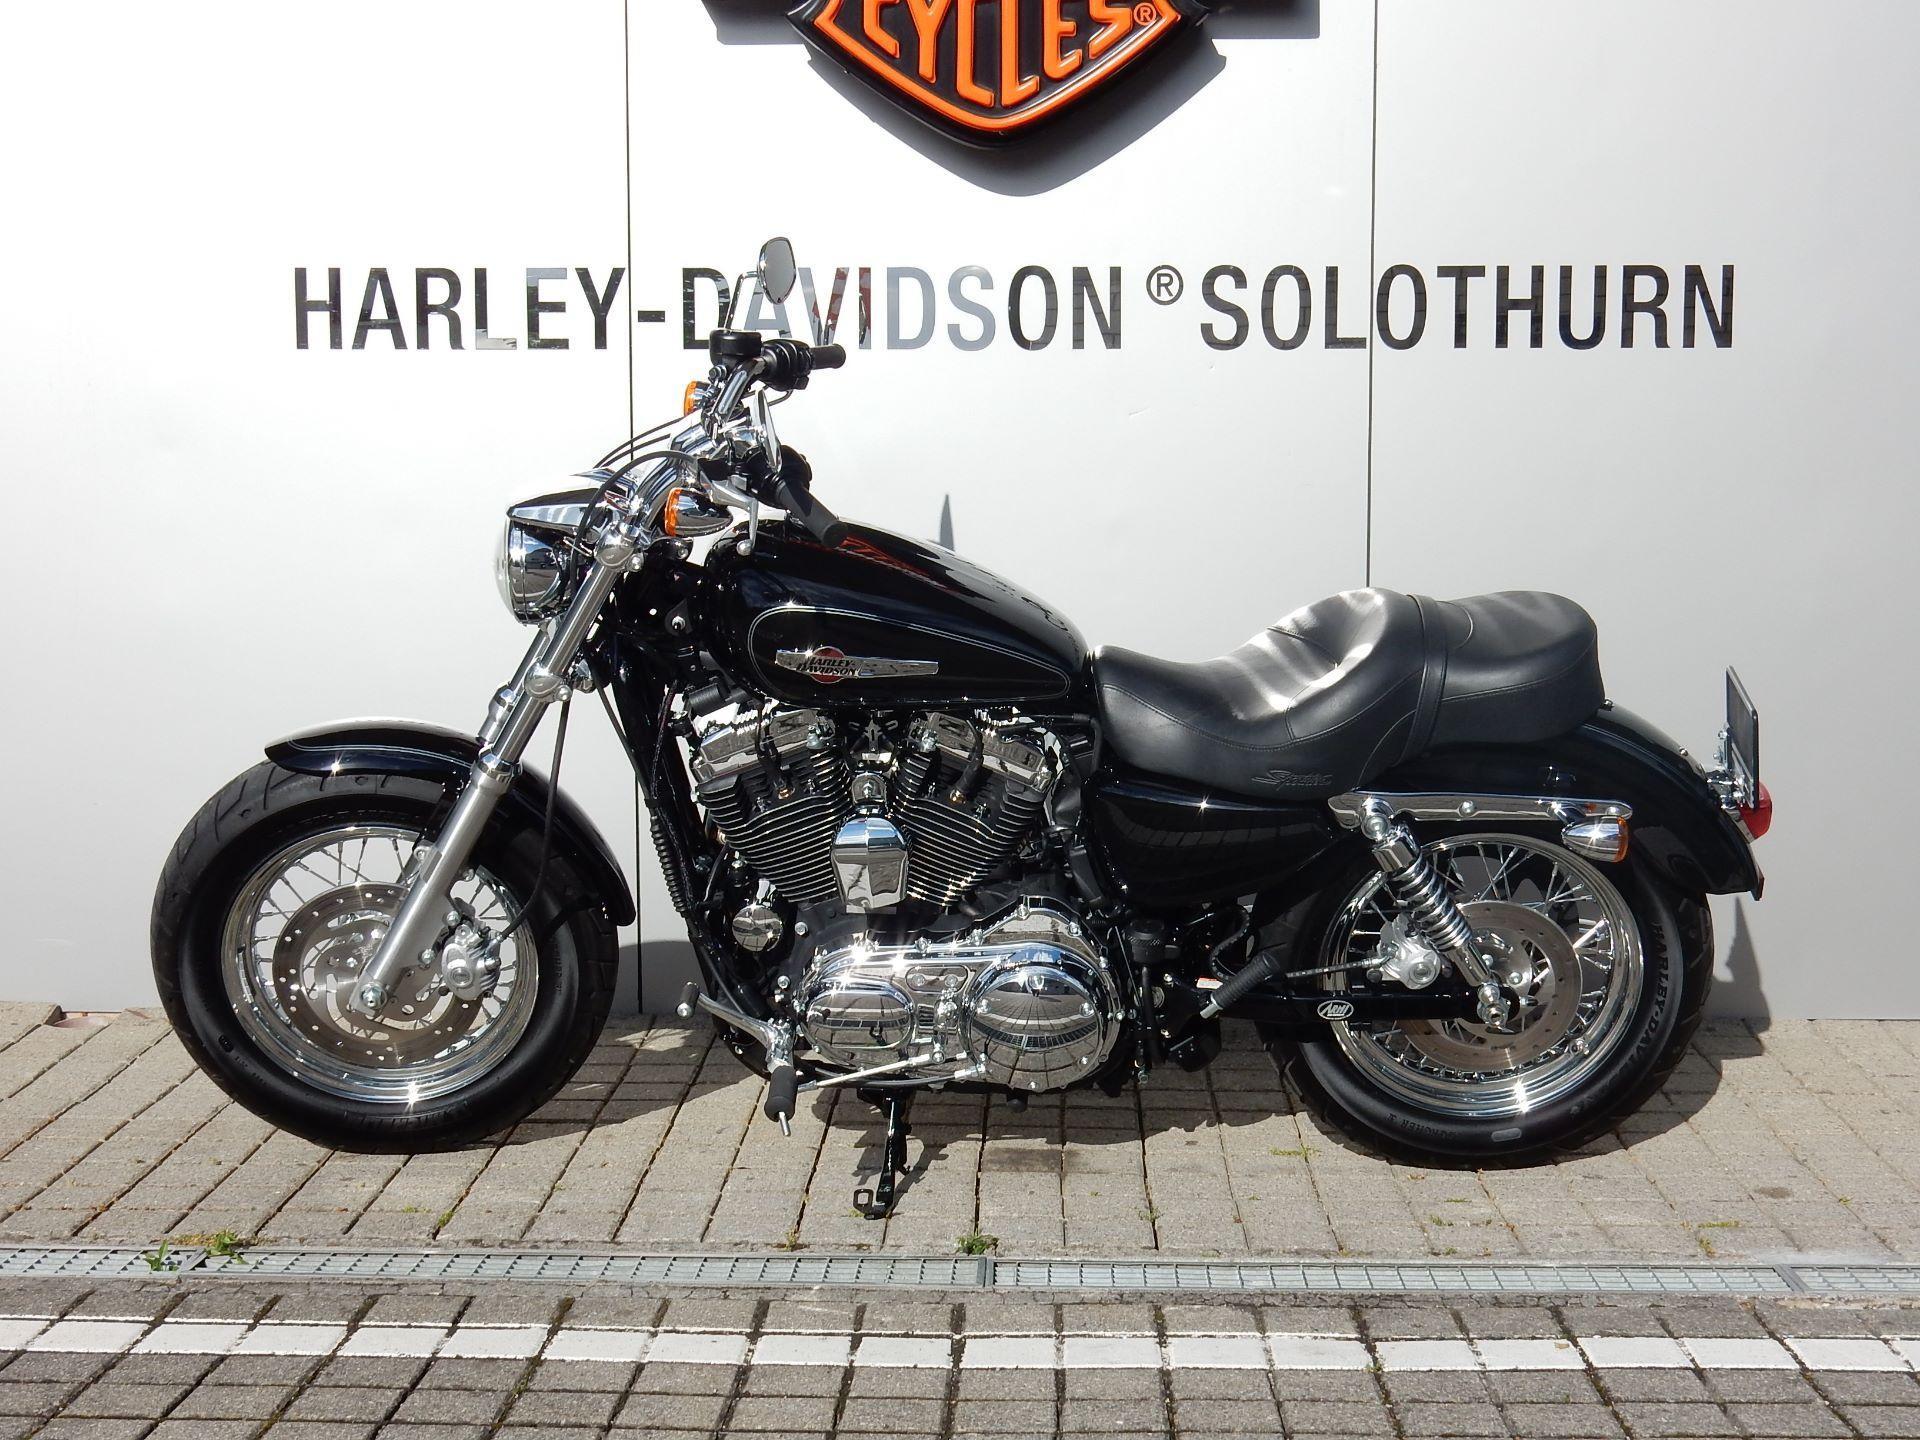 motorrad occasion kaufen harley davidson xl 1200c sportster custom arni harley davidson hessigkofen. Black Bedroom Furniture Sets. Home Design Ideas